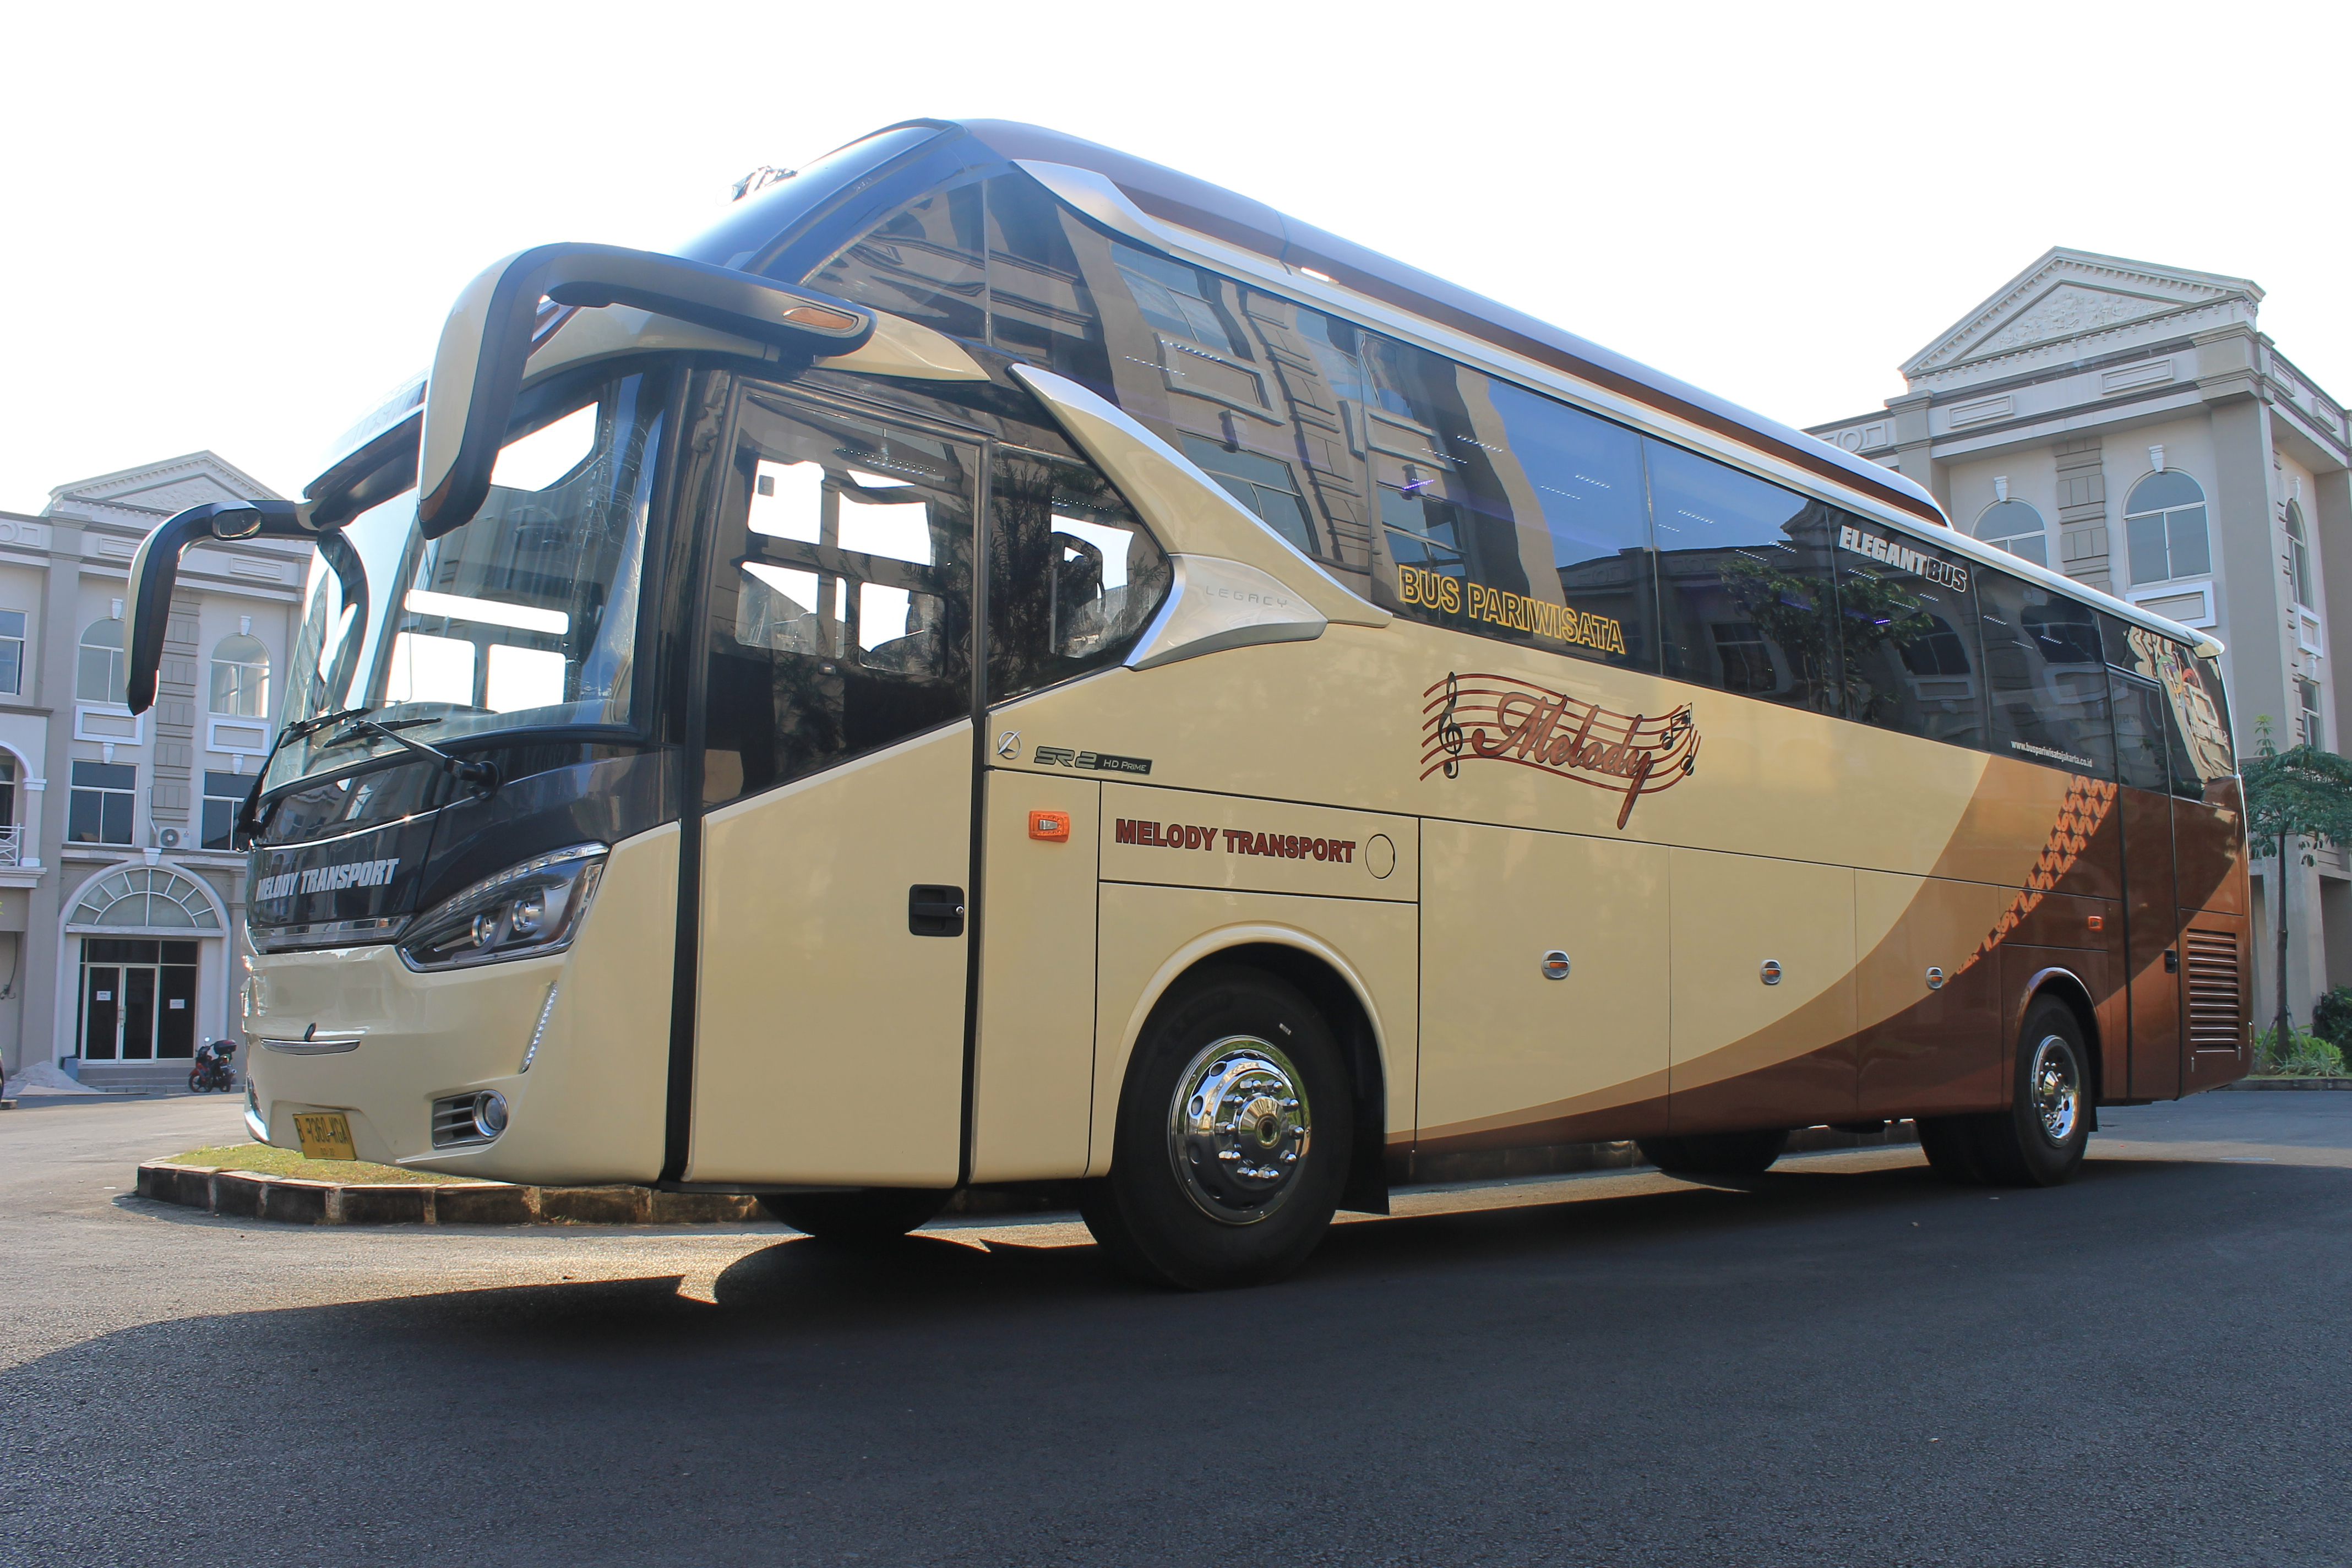 pusat sewa bus pariwisata termurah di jakarta bekasi depok tangerang Melody Transport